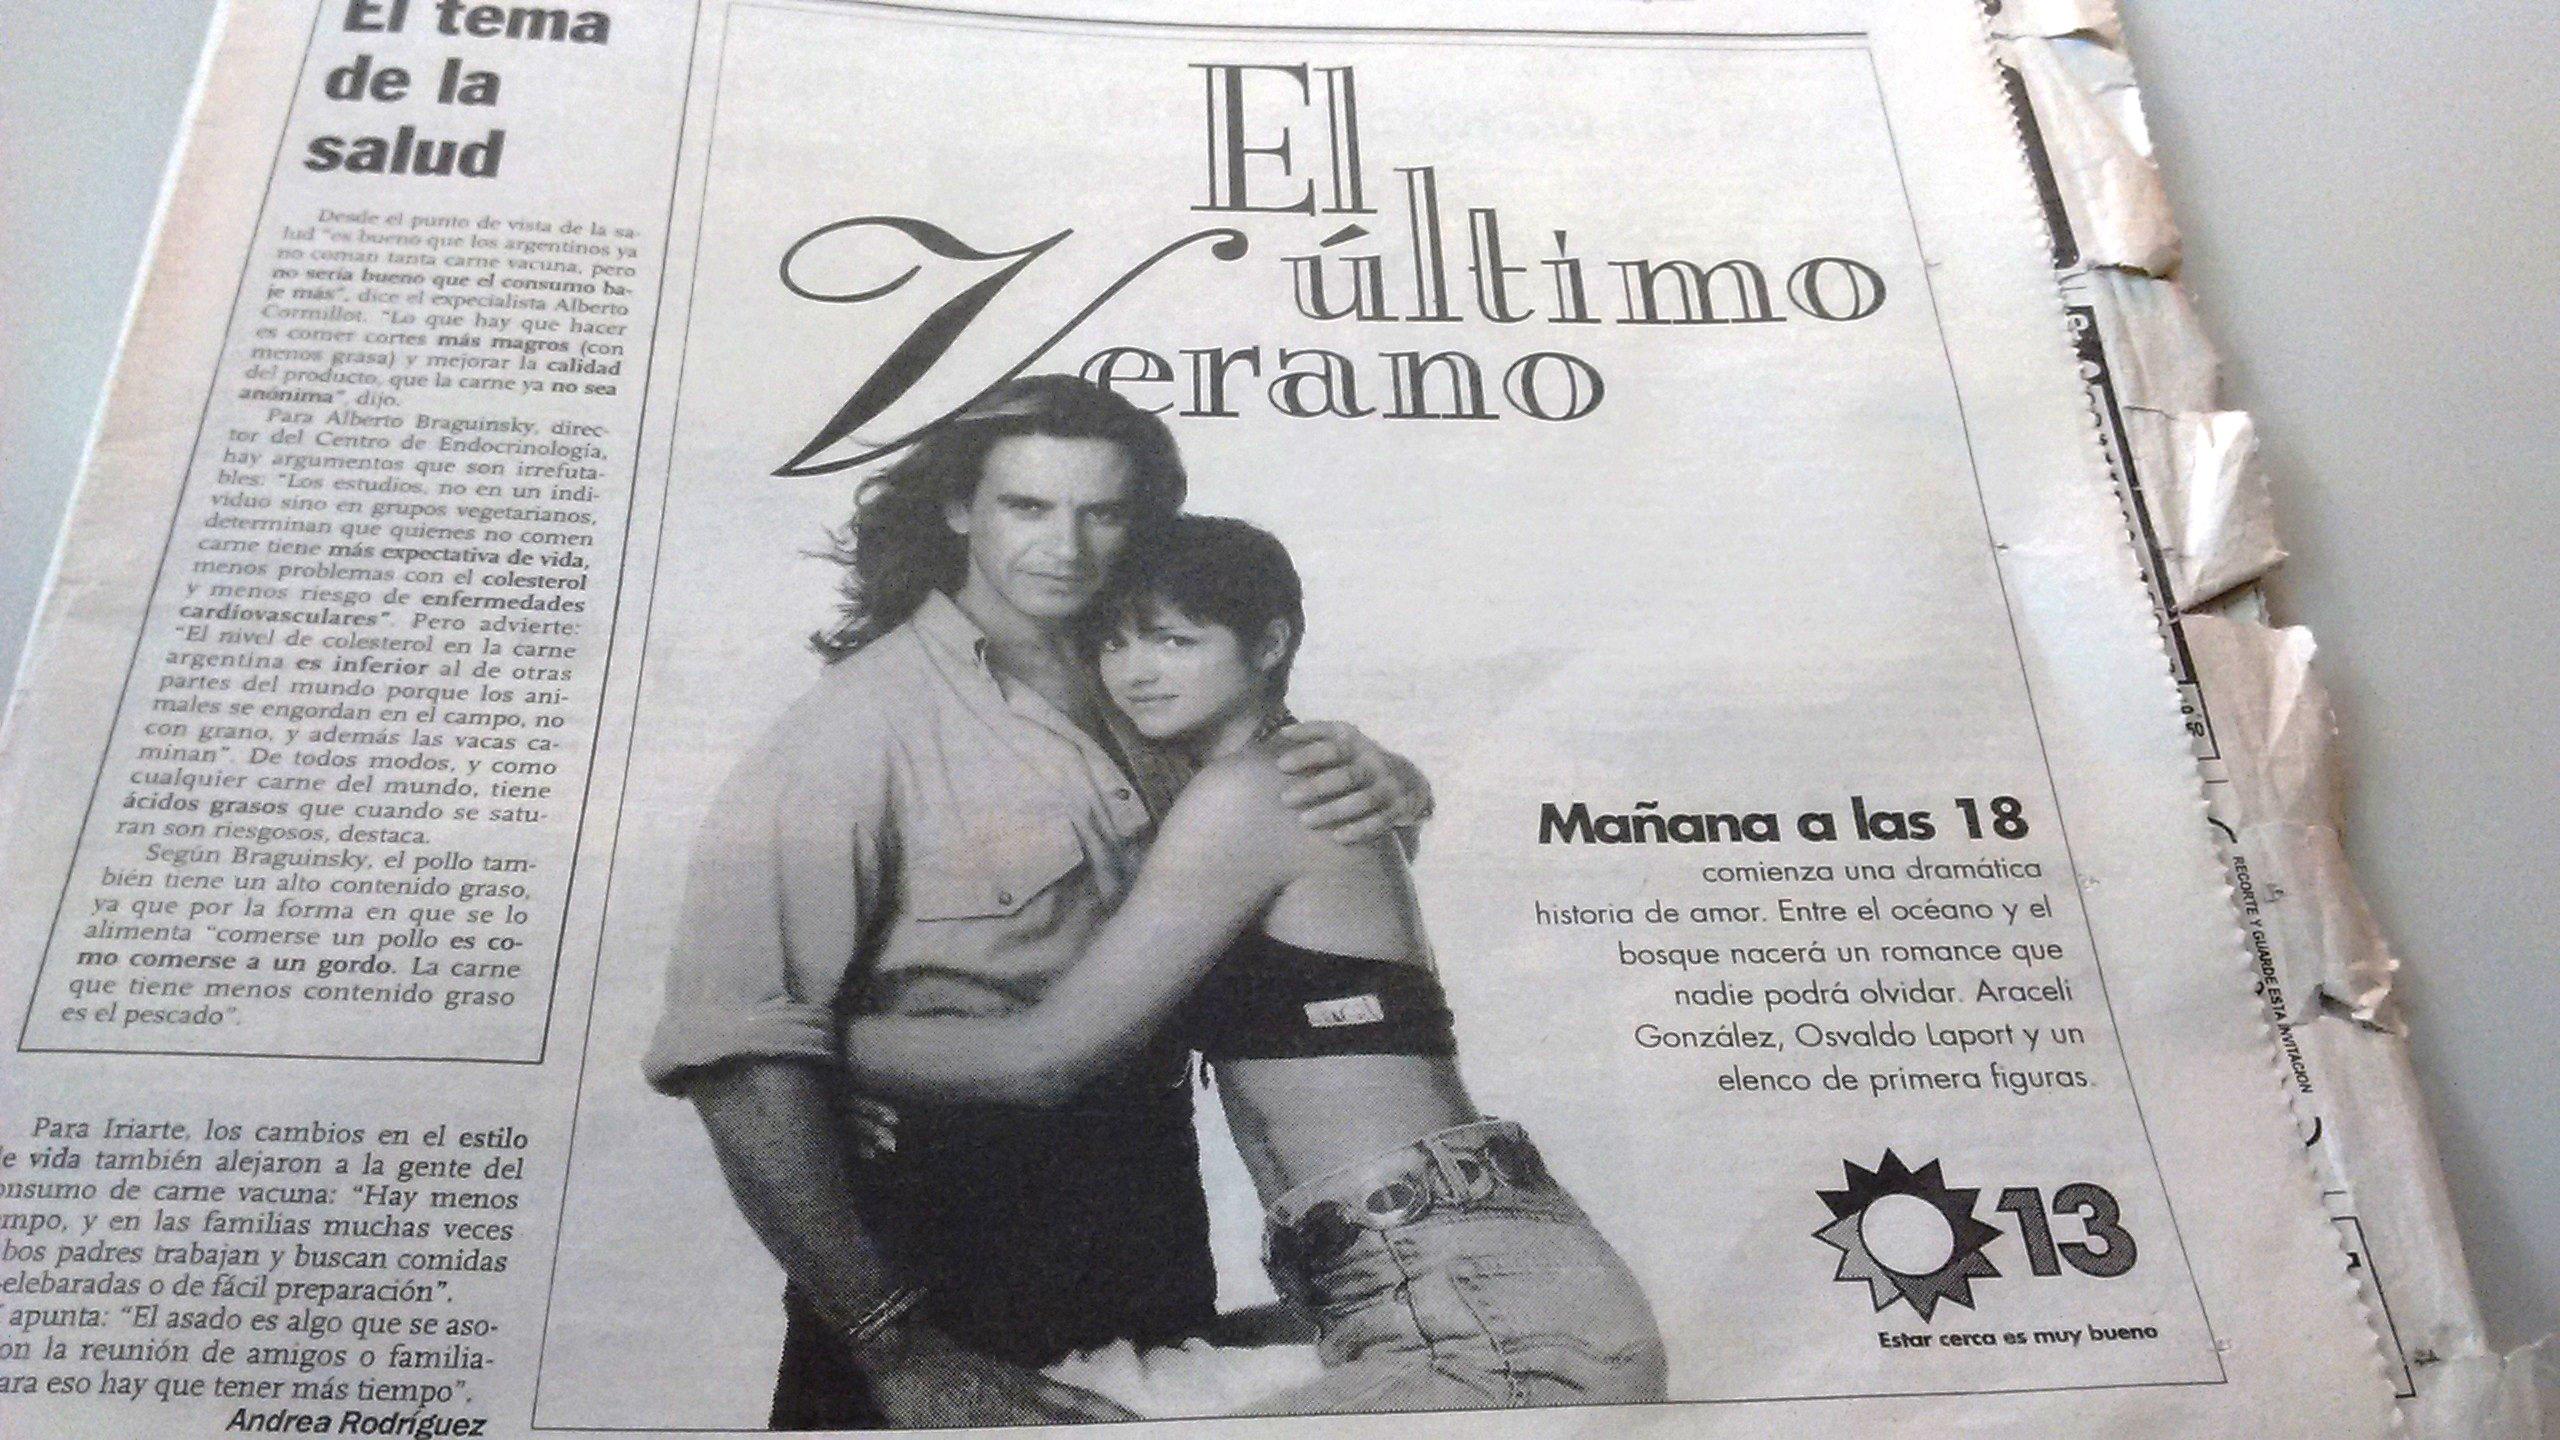 Araceli González and Osvaldo Laport in El último verano (1996)